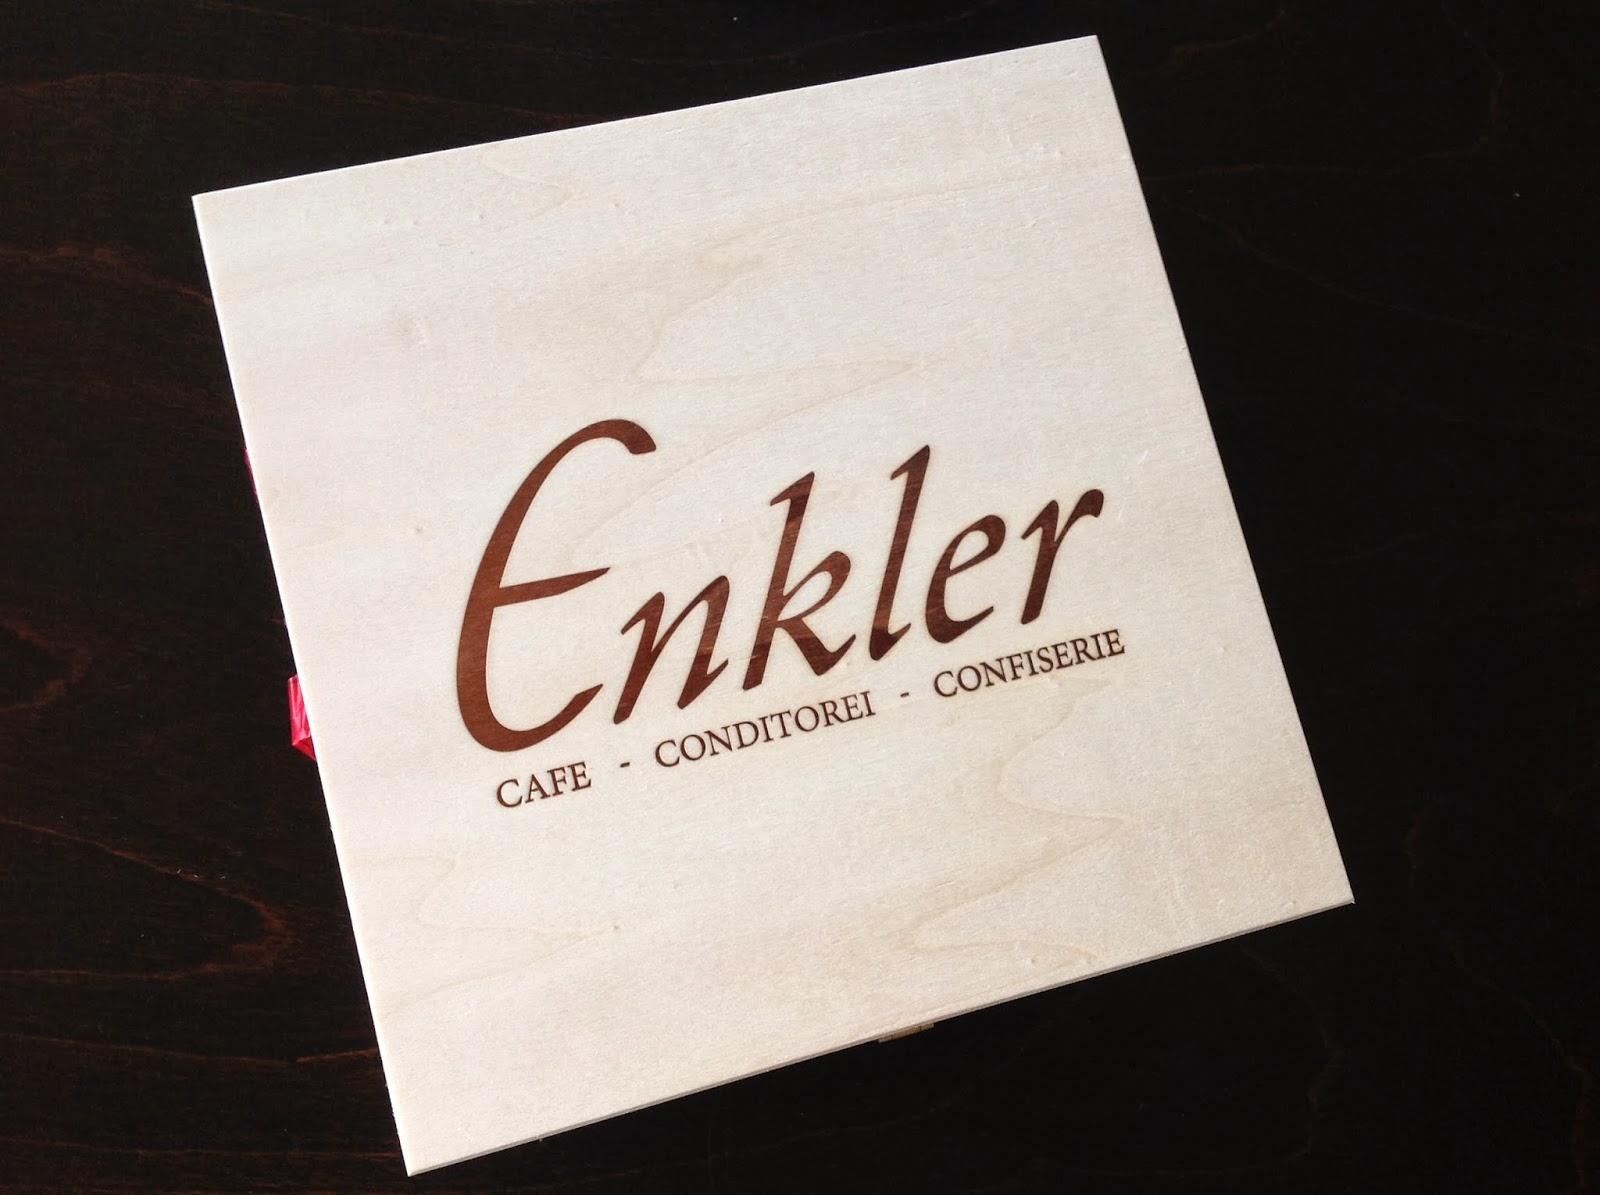 Cafe Konditorei Confiserie Enkler